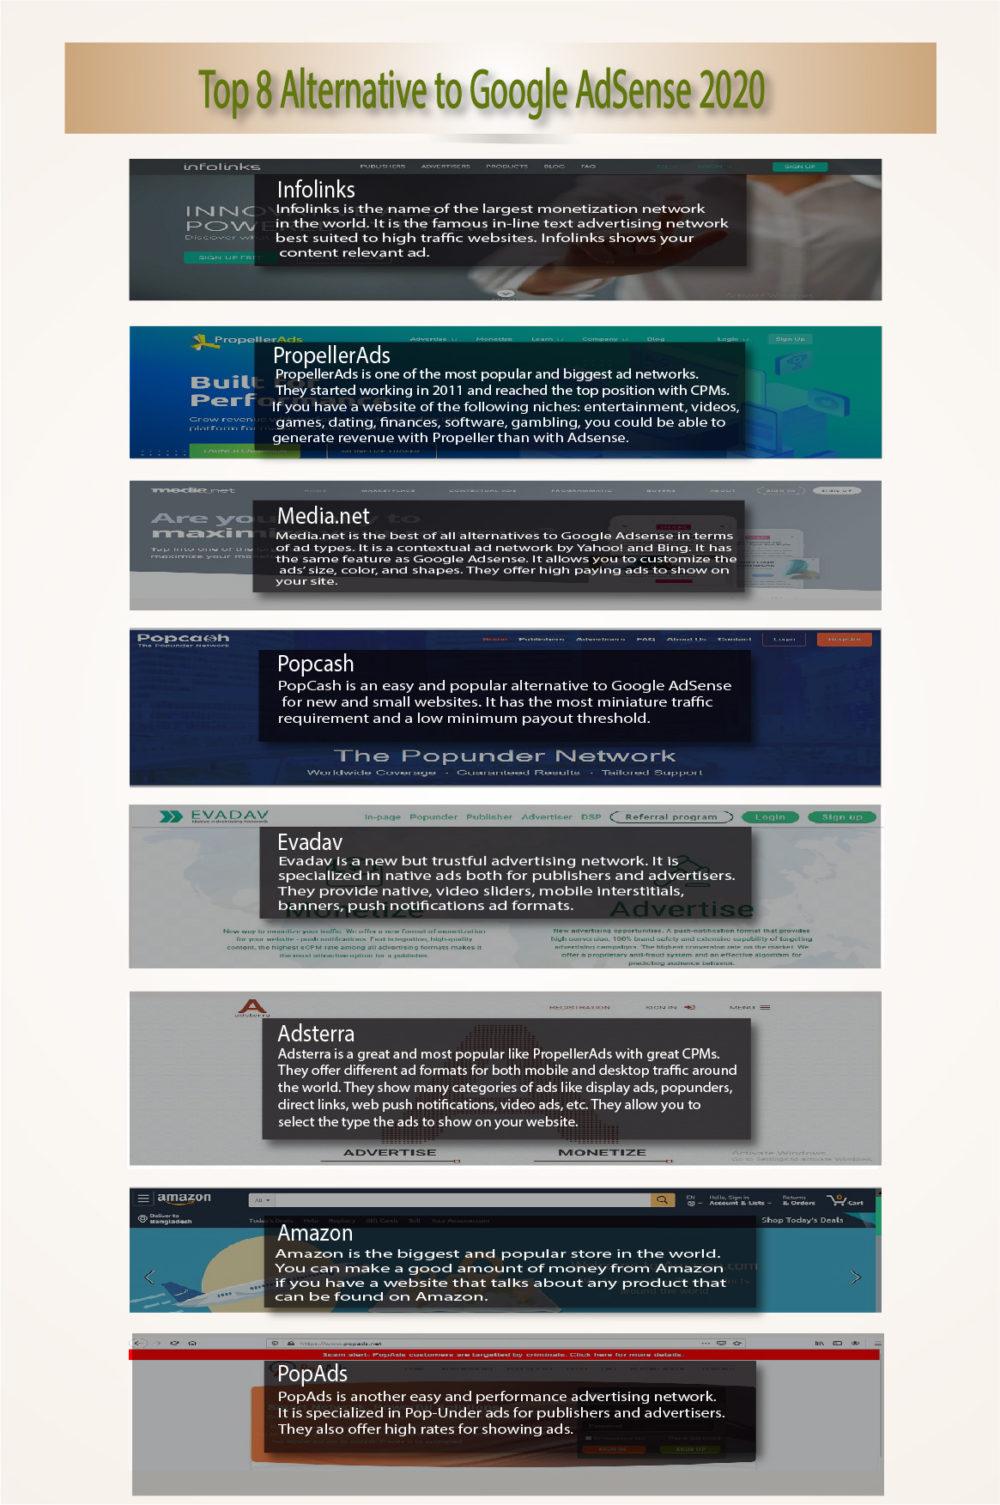 Top 8 Alternative to Google AdSense 2020